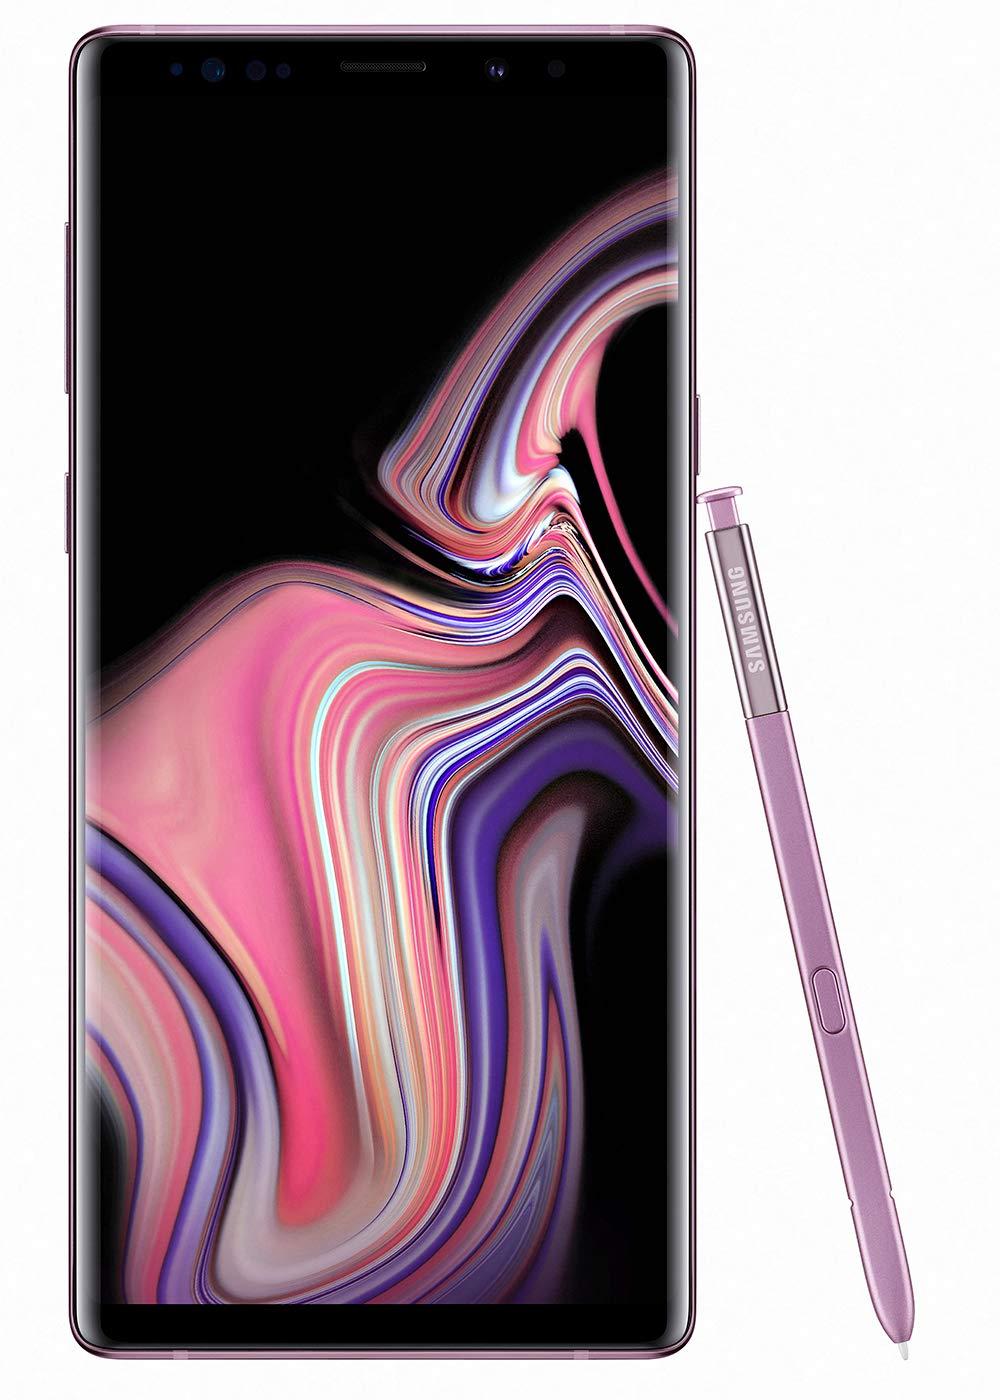 Samsung Galaxy Note 9 Dual SIM - 512GB, 8GB RAM, 4G LTE, Lavender Purple